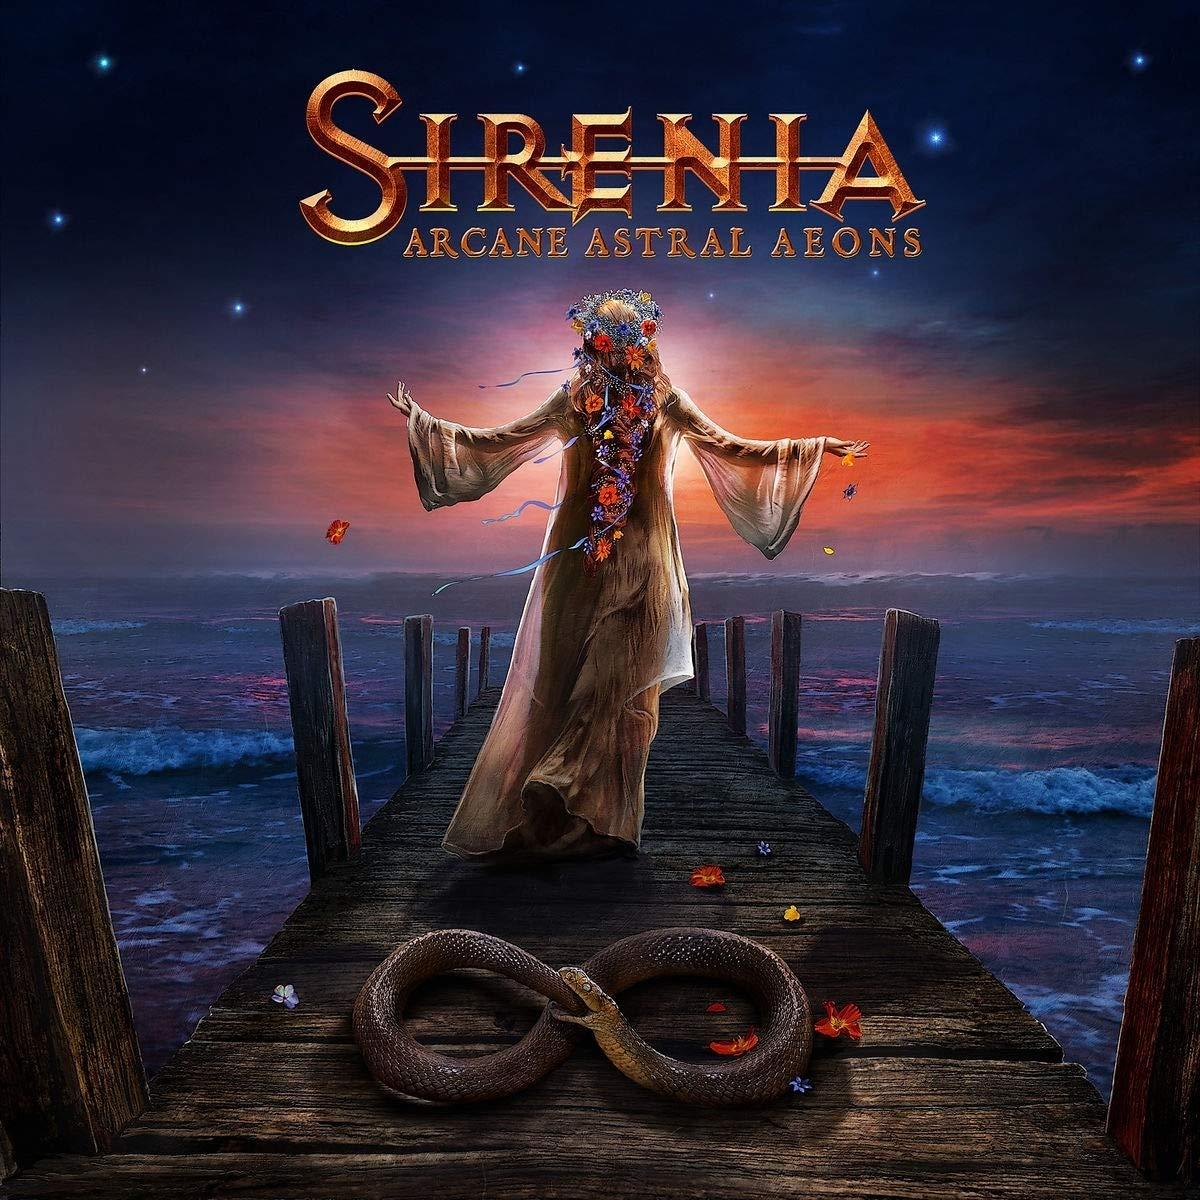 Sirenia - Arcane Astral Aeons (Digipack)